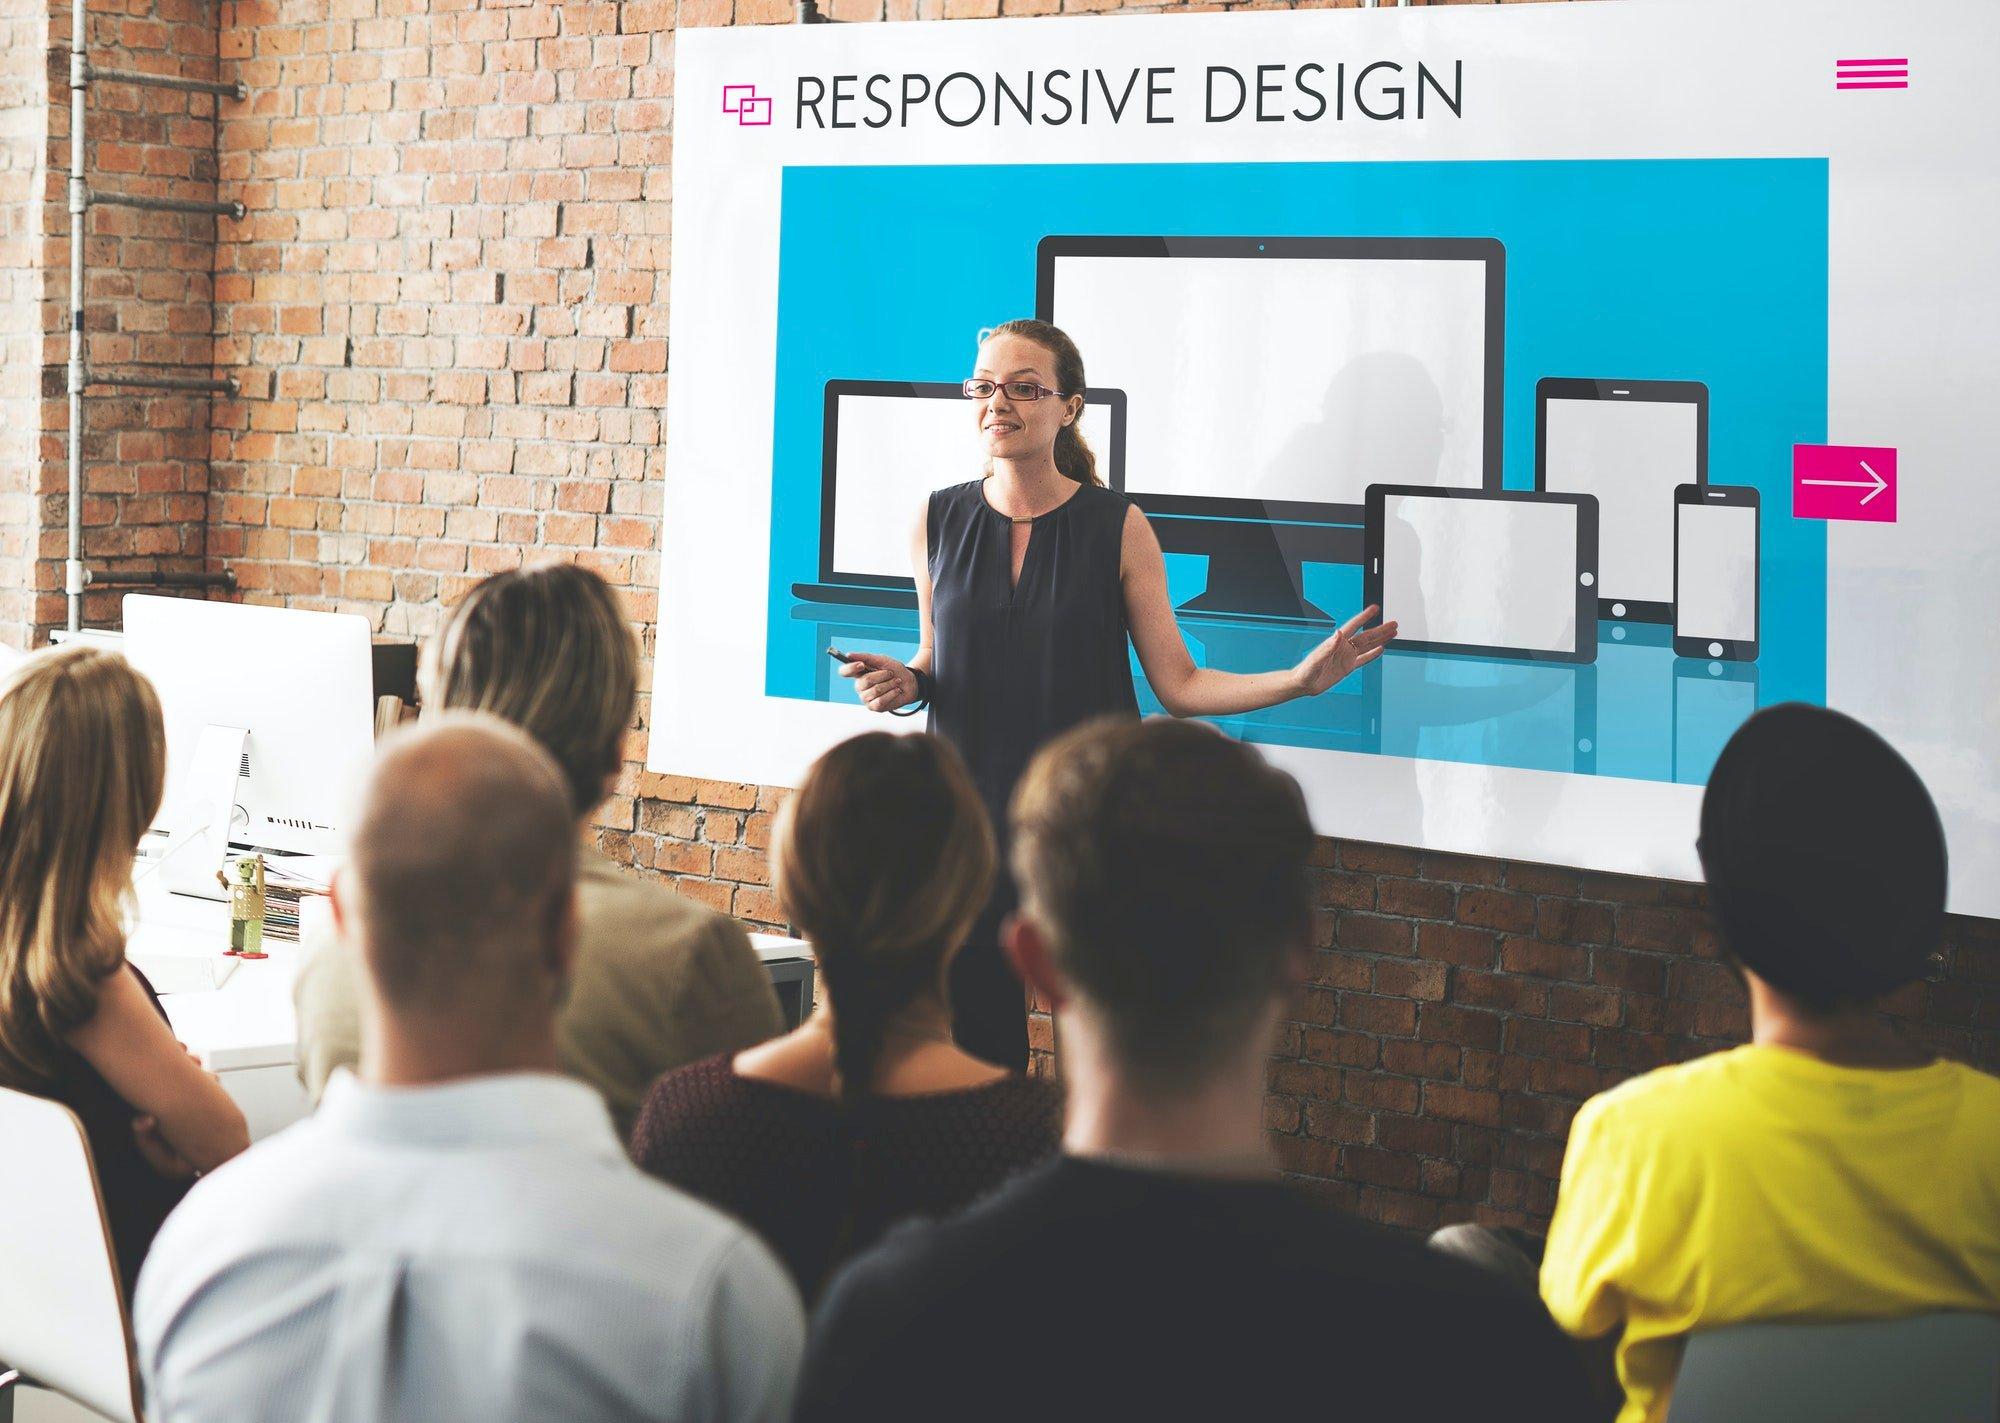 Responsive Design Layout Software Concept